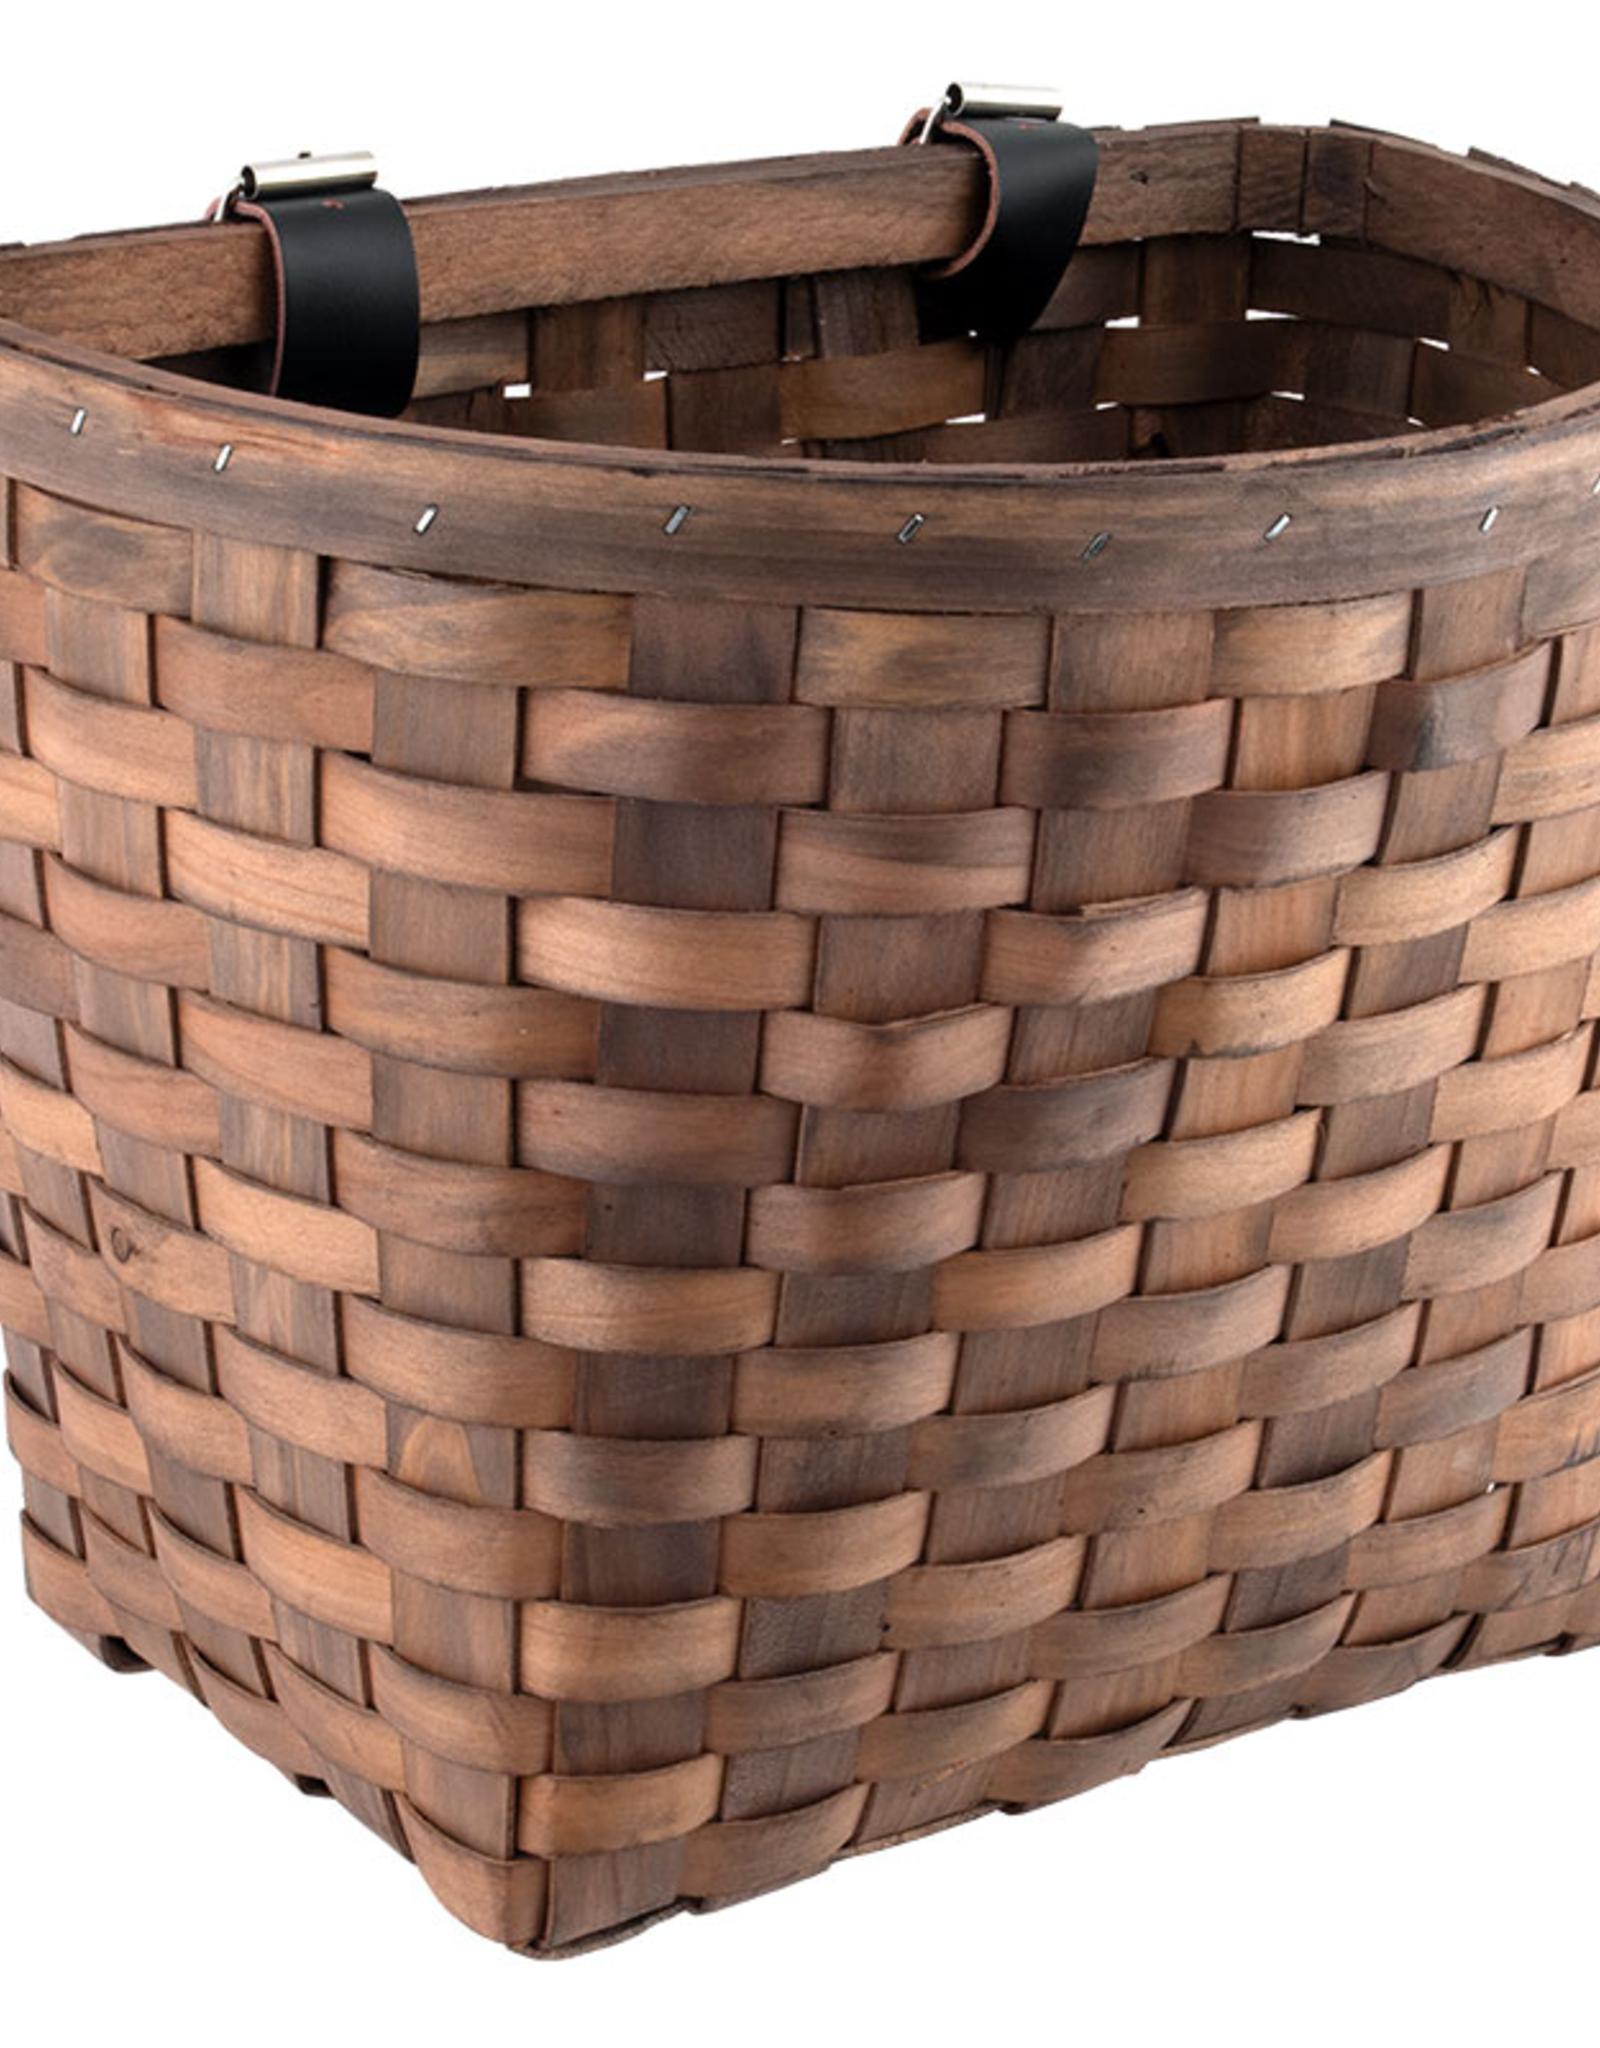 J & B Importers Sunlite Wood Woven Basket Beech Dark Brown